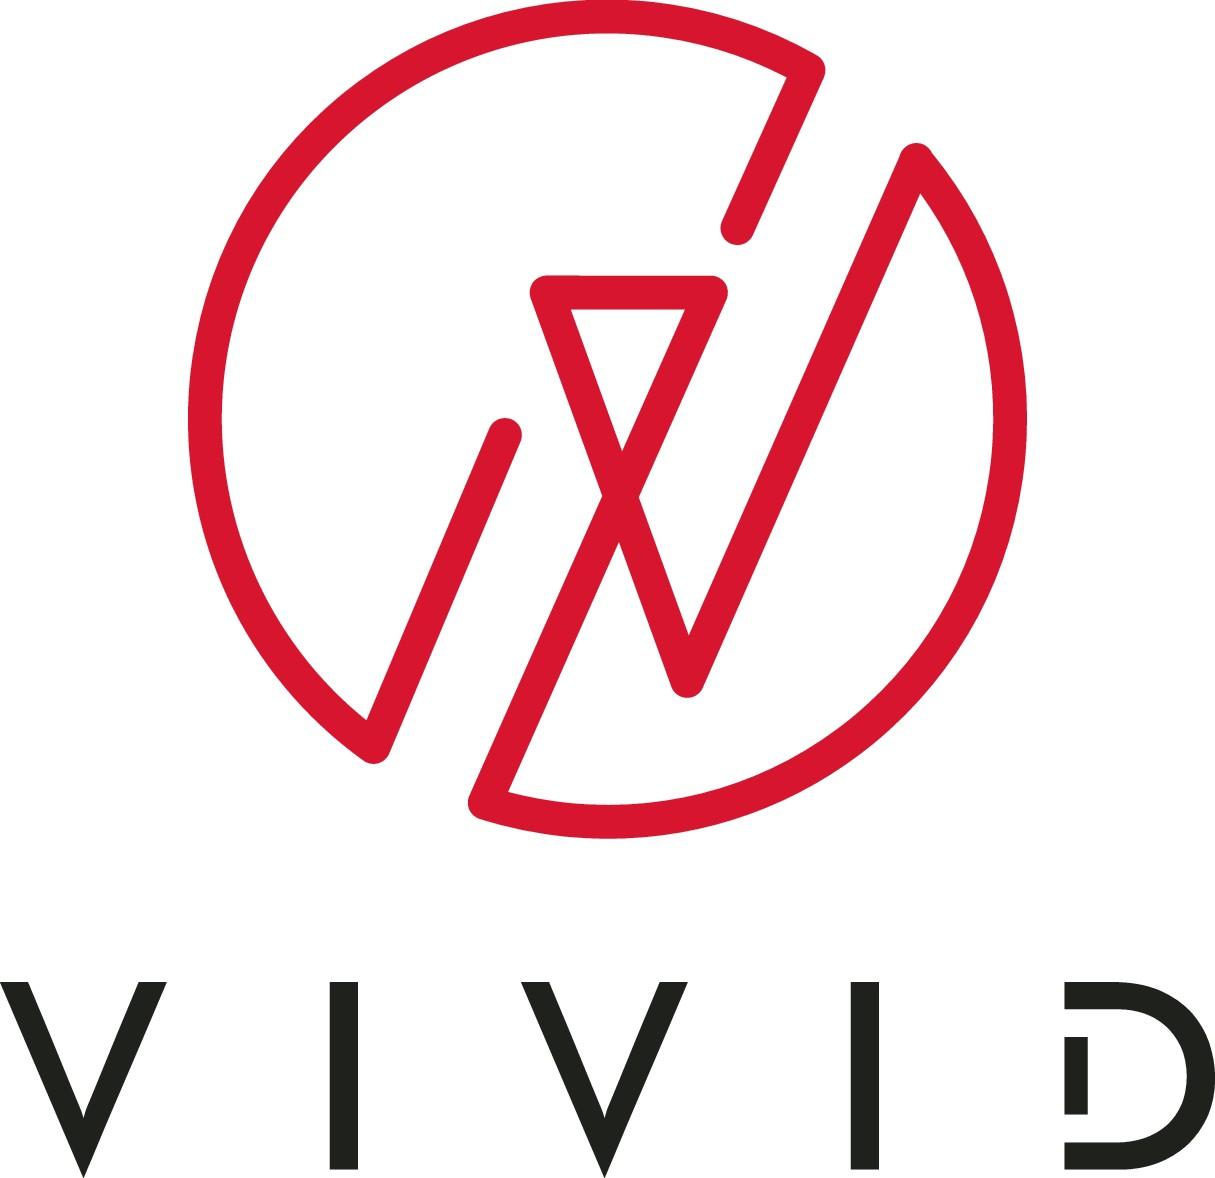 Logo design for Vivid